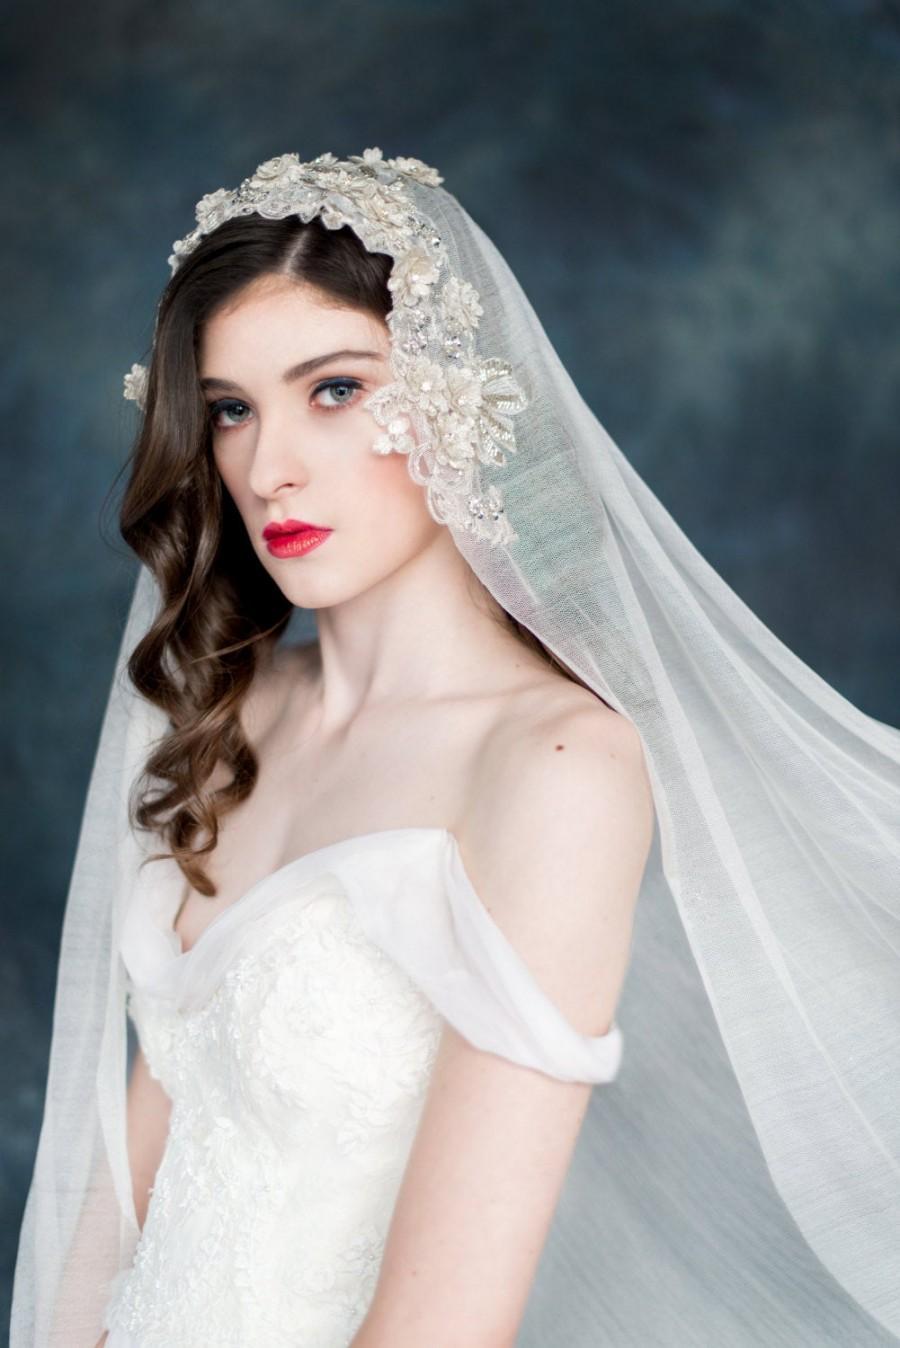 Wedding - Lace Mantilla Veil, Silk Bridal Veil, Embroidered Lace Veil, Alternative Wedding Veil, Crystal Veil, Ivory Lace Veil, Champagne Veil, MEADOW